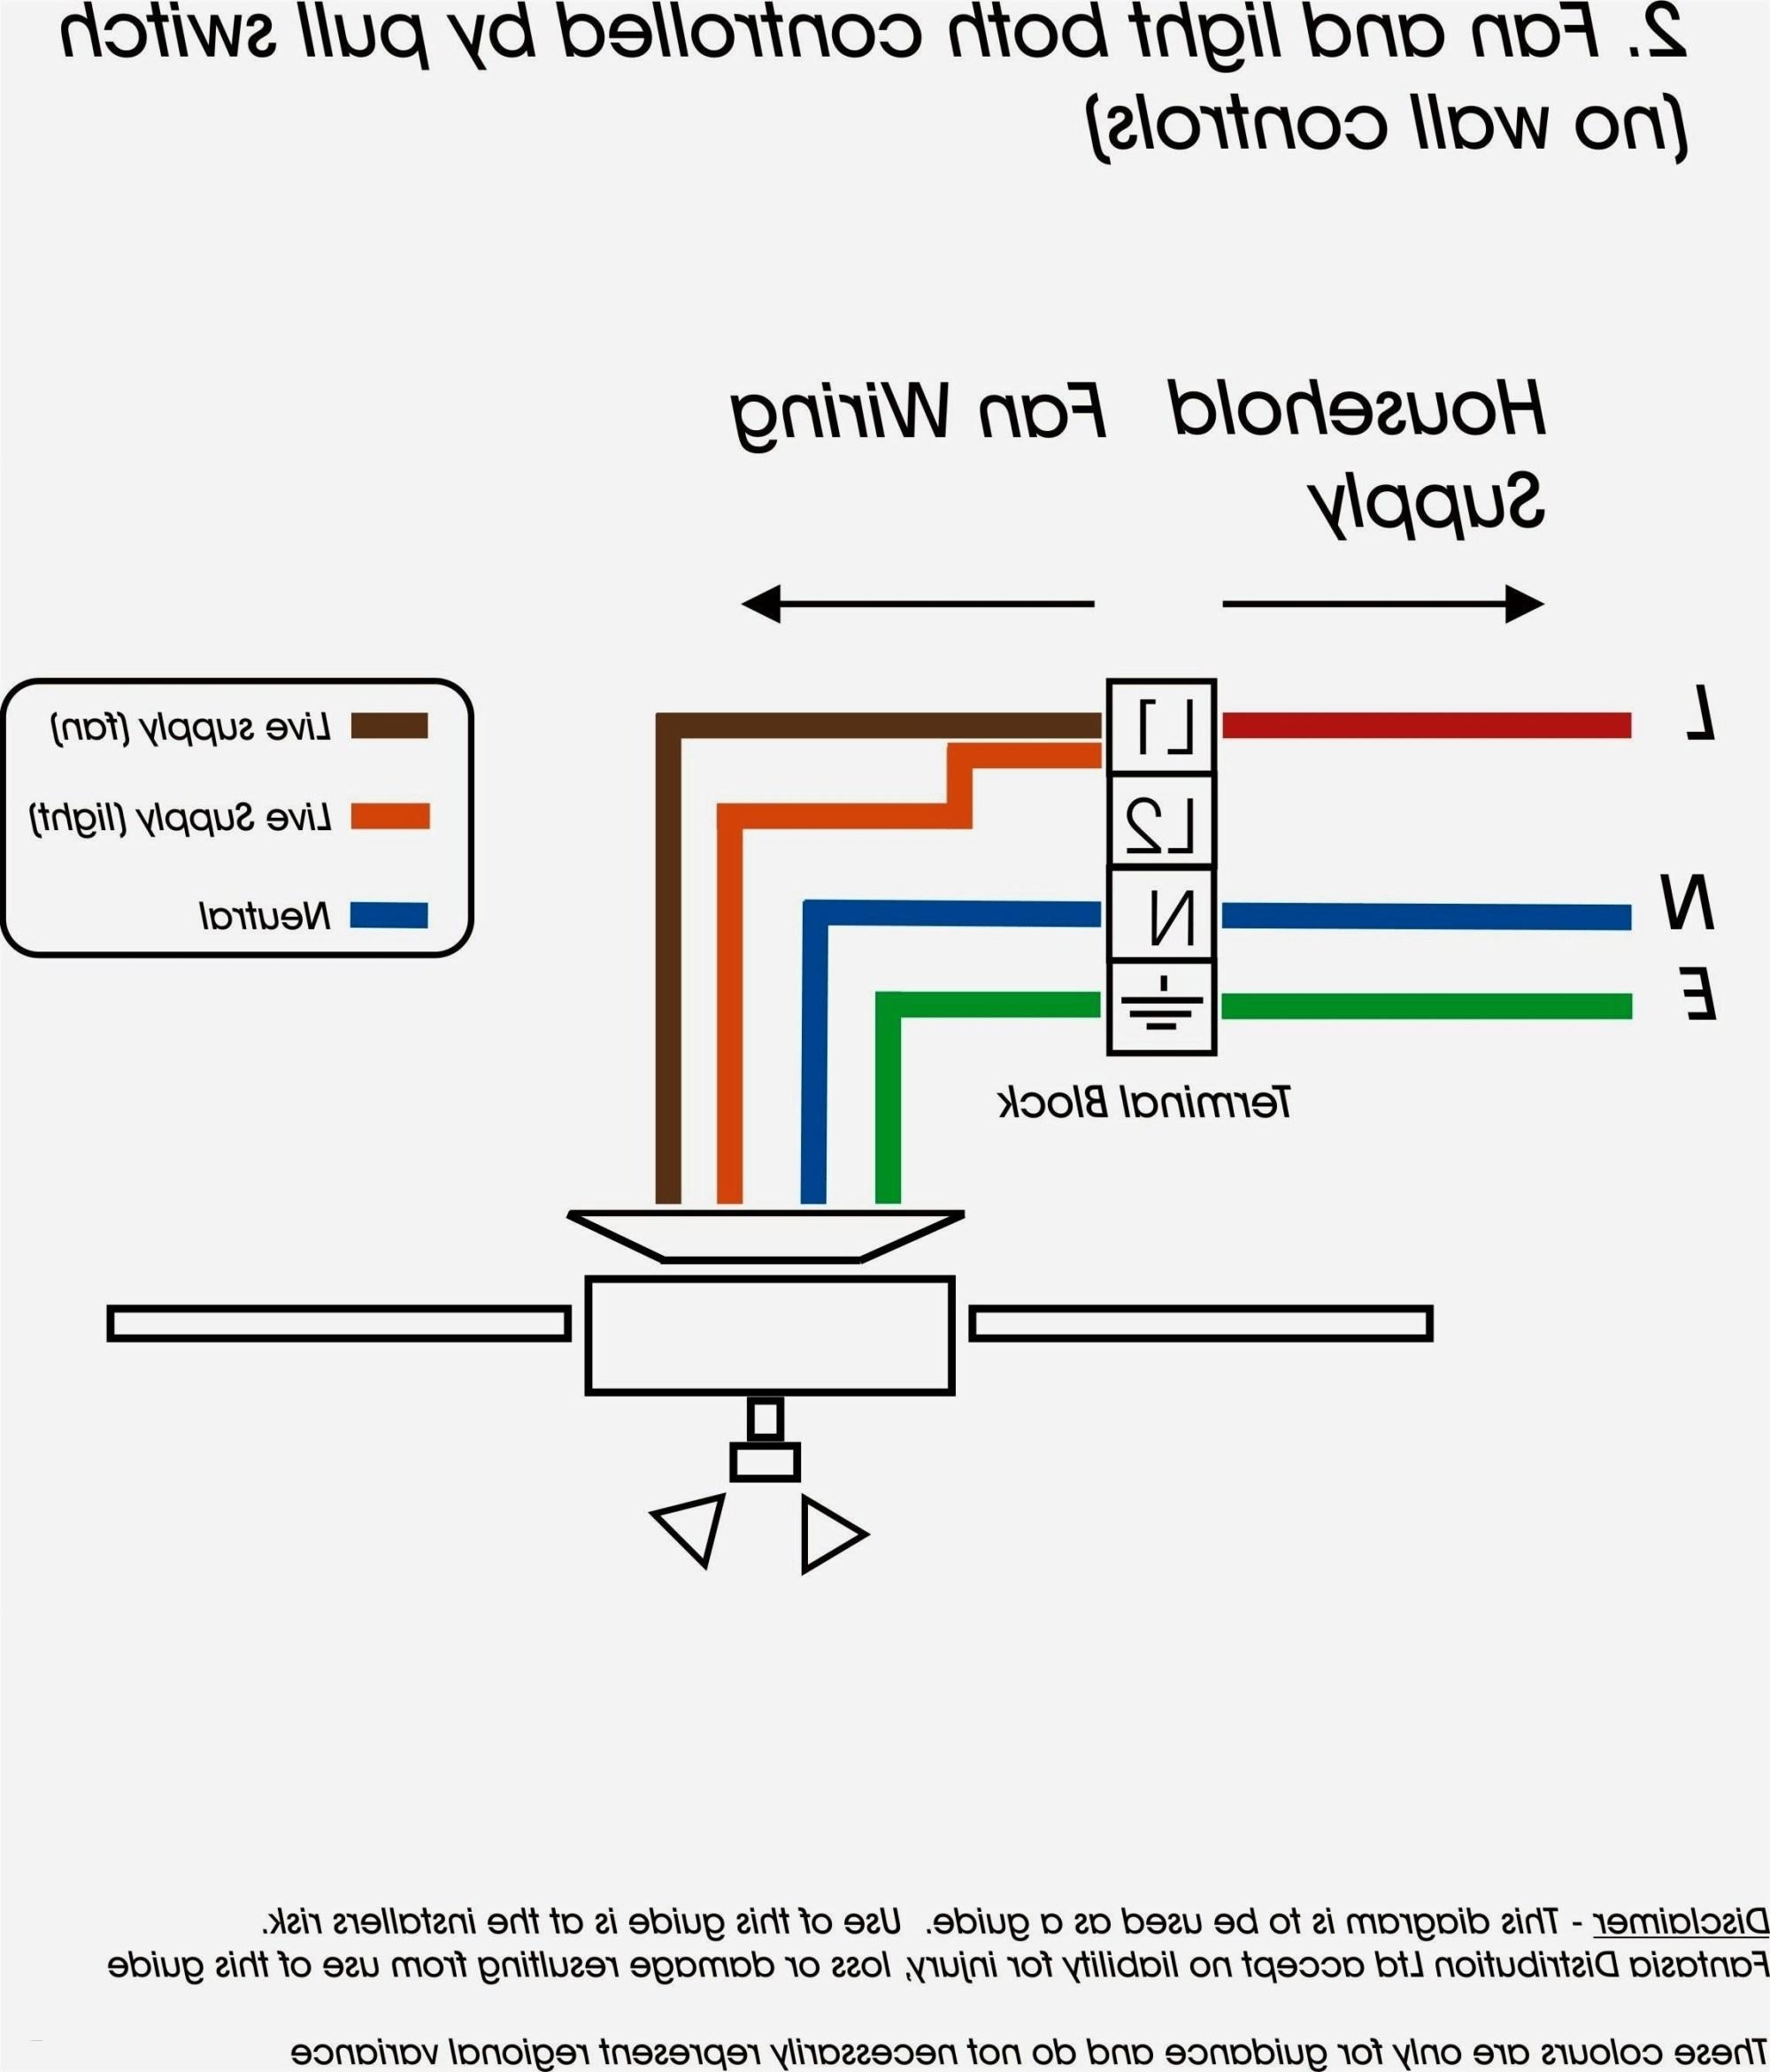 hight resolution of 60075 arco alternator wiring diagram wiring diagram ebookarco wiring diagrams basic electronics wiring diagramarco alternator wiring